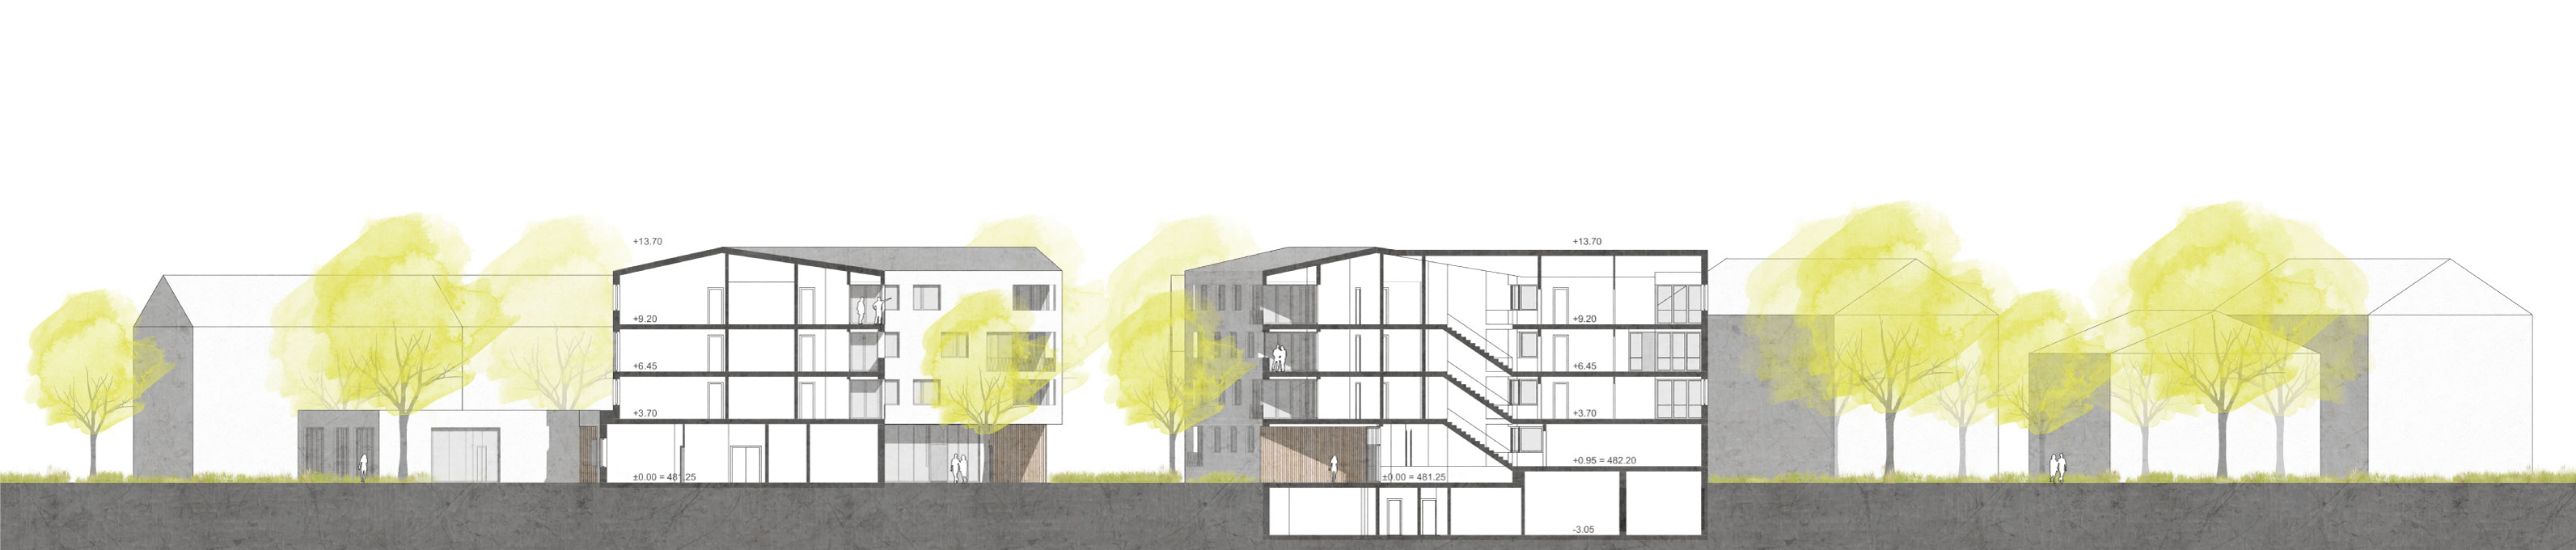 STUDIOKUBIK-architektur-architecture-berlin-wohnanlage-karl-wagner-straße-bad-aibling-sc